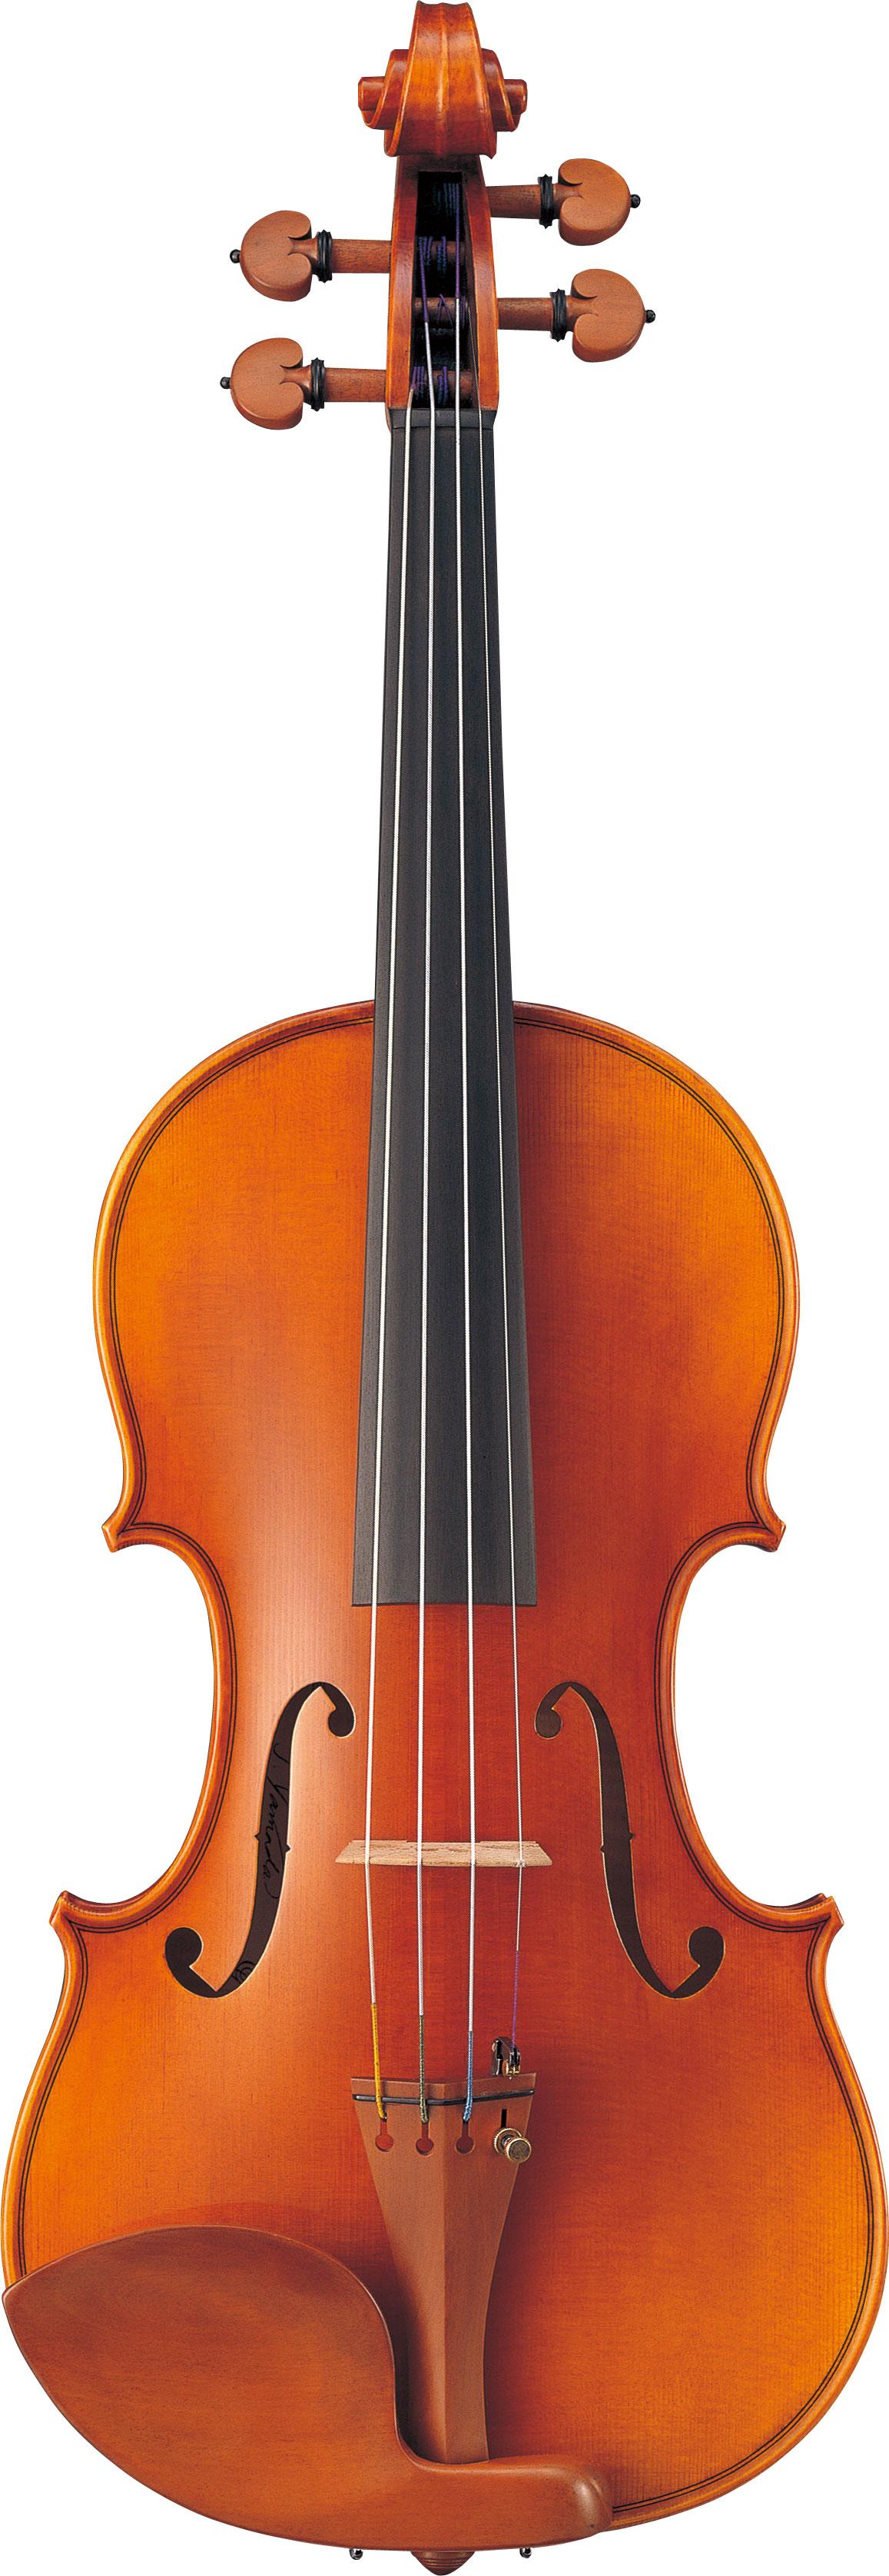 Yamaha v20g full size 4 4 violin intermediate model for Violin yamaha 4 4